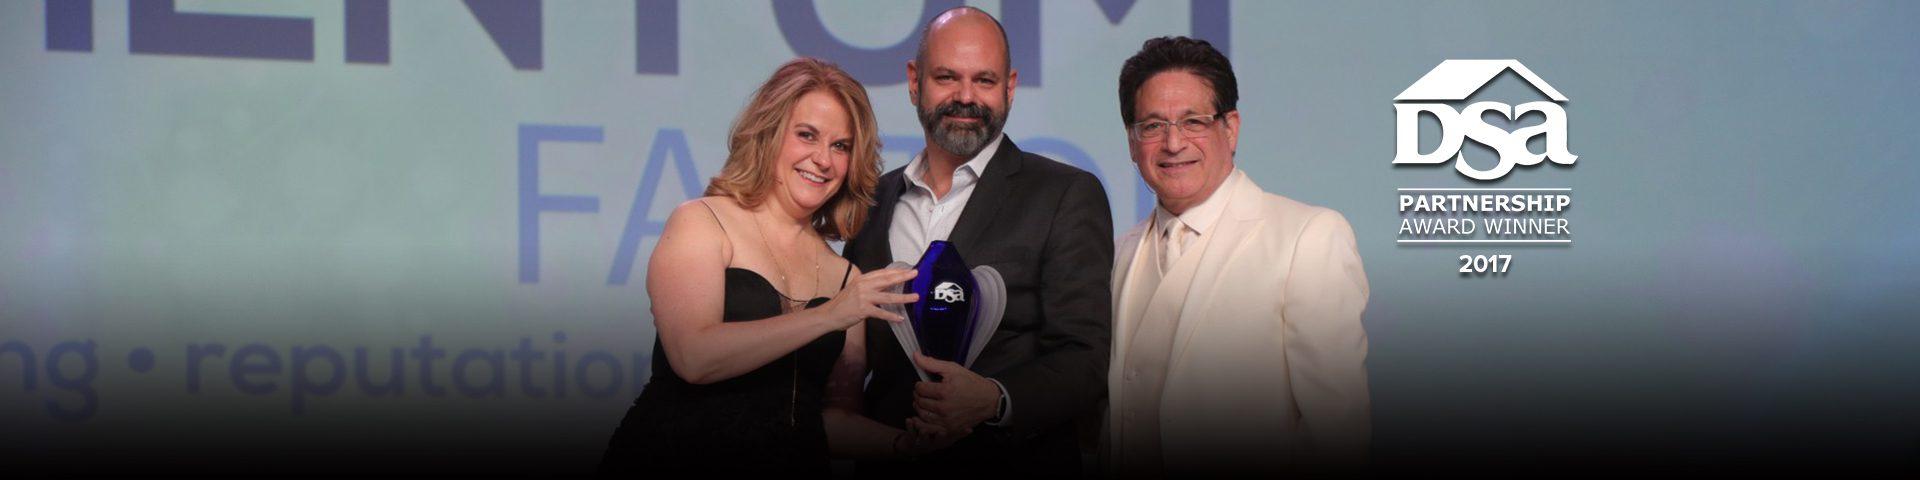 Momentum Factor - 2017 DSA Partnership Award Winner